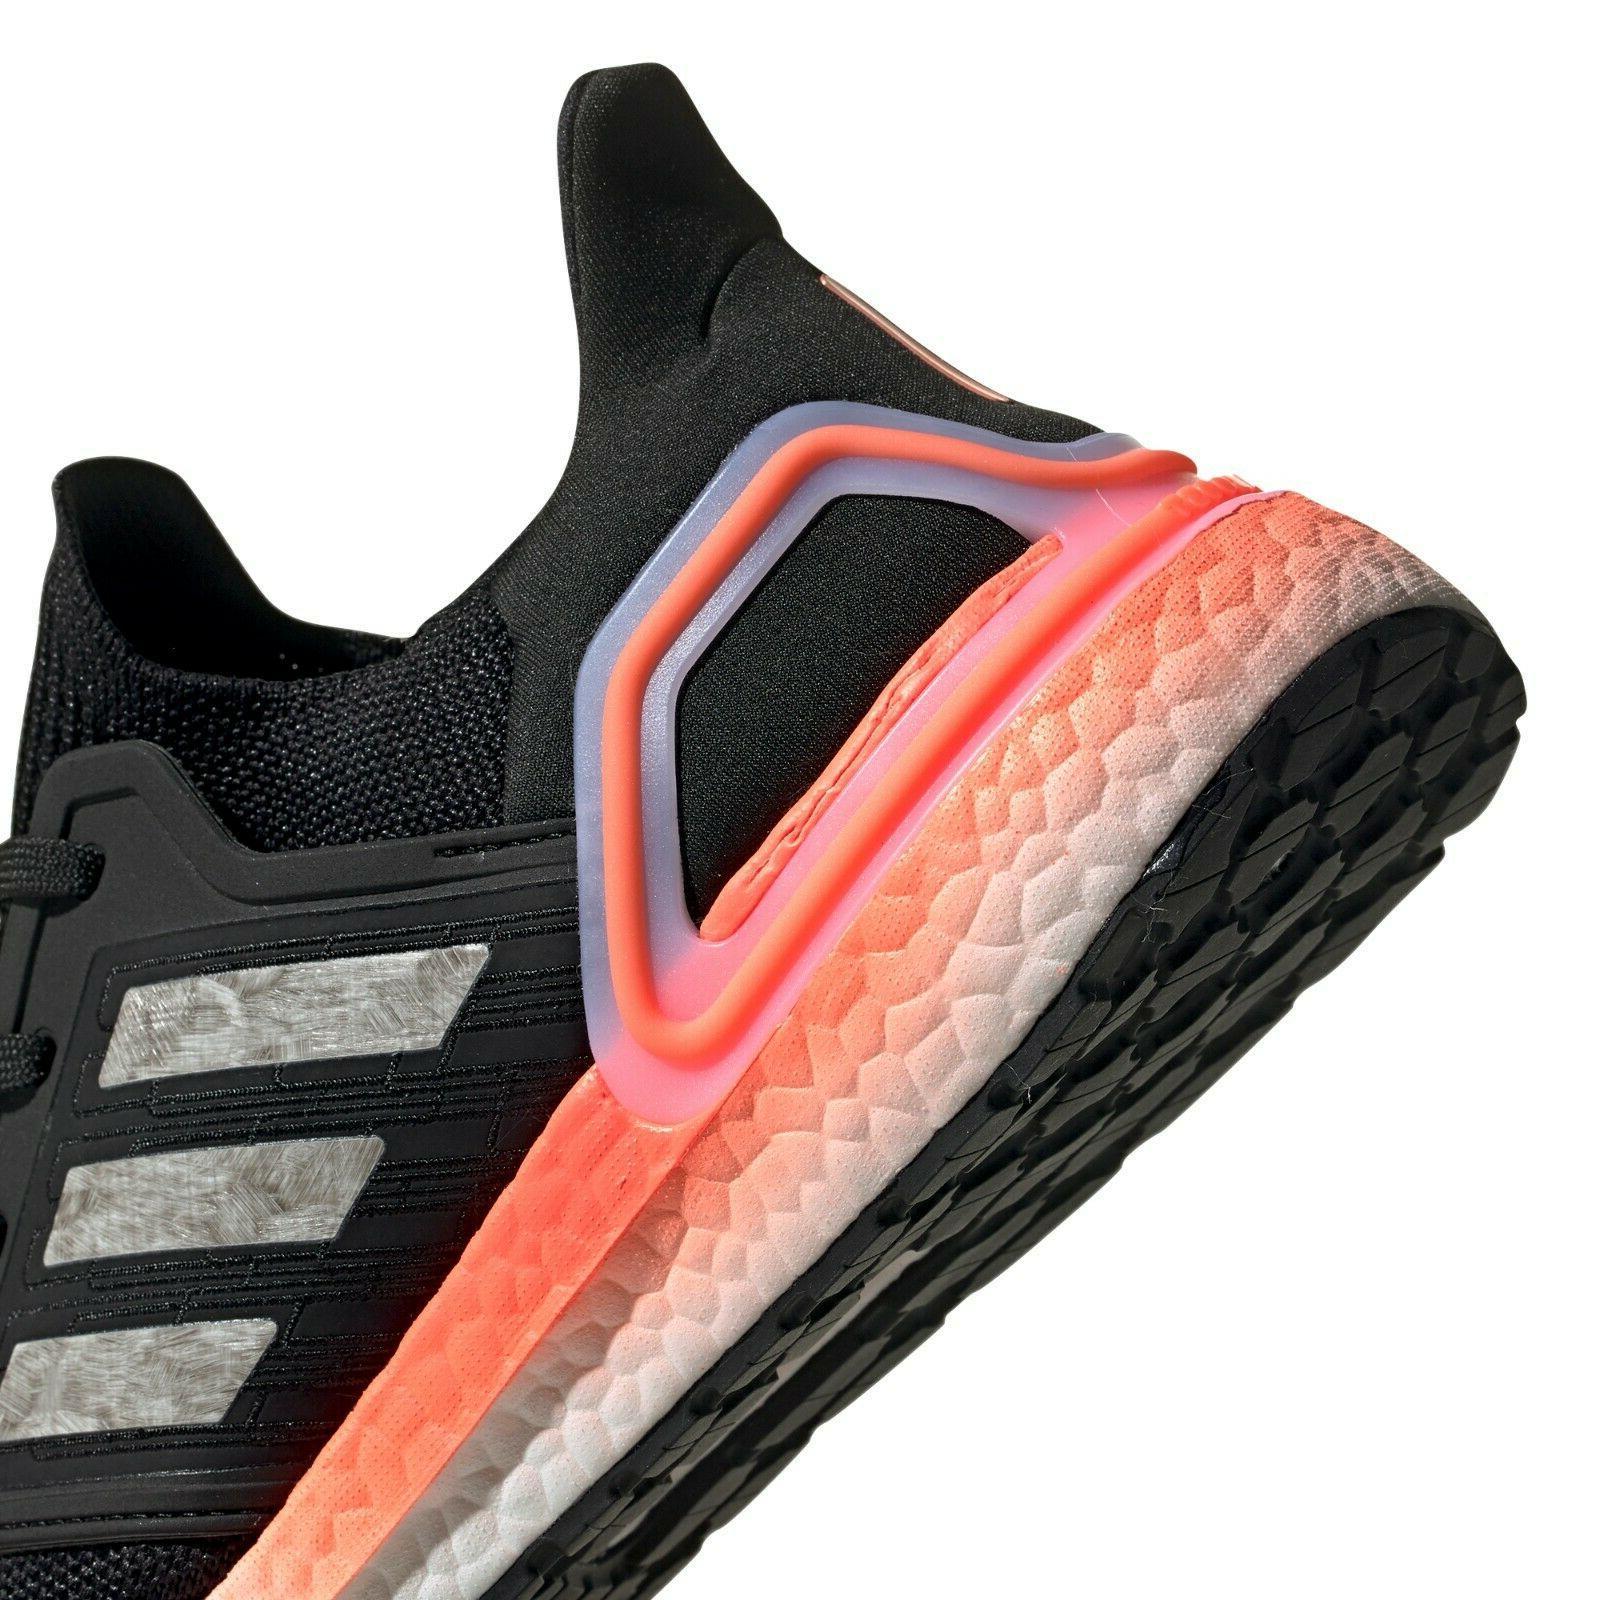 Adidas Ultraboost Running Sneaker Trainer